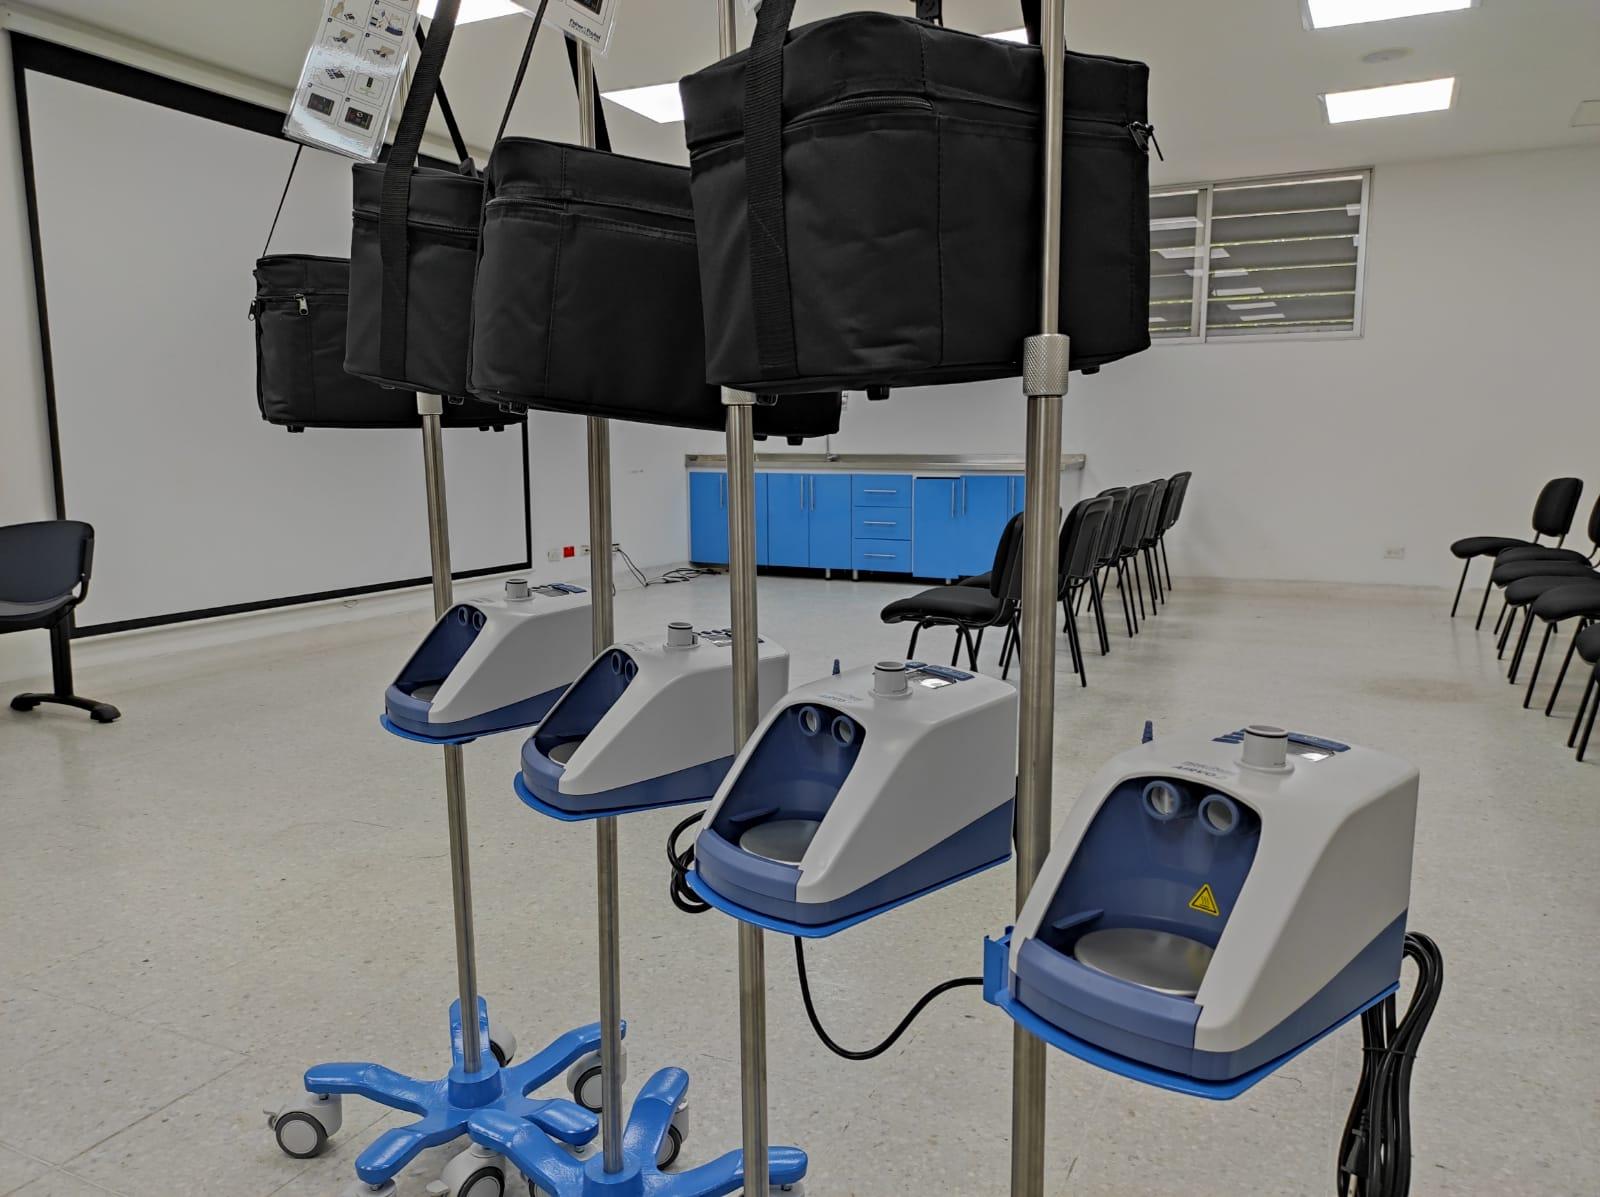 Hospitales reciben equipos vitales para salvar vidas. 1